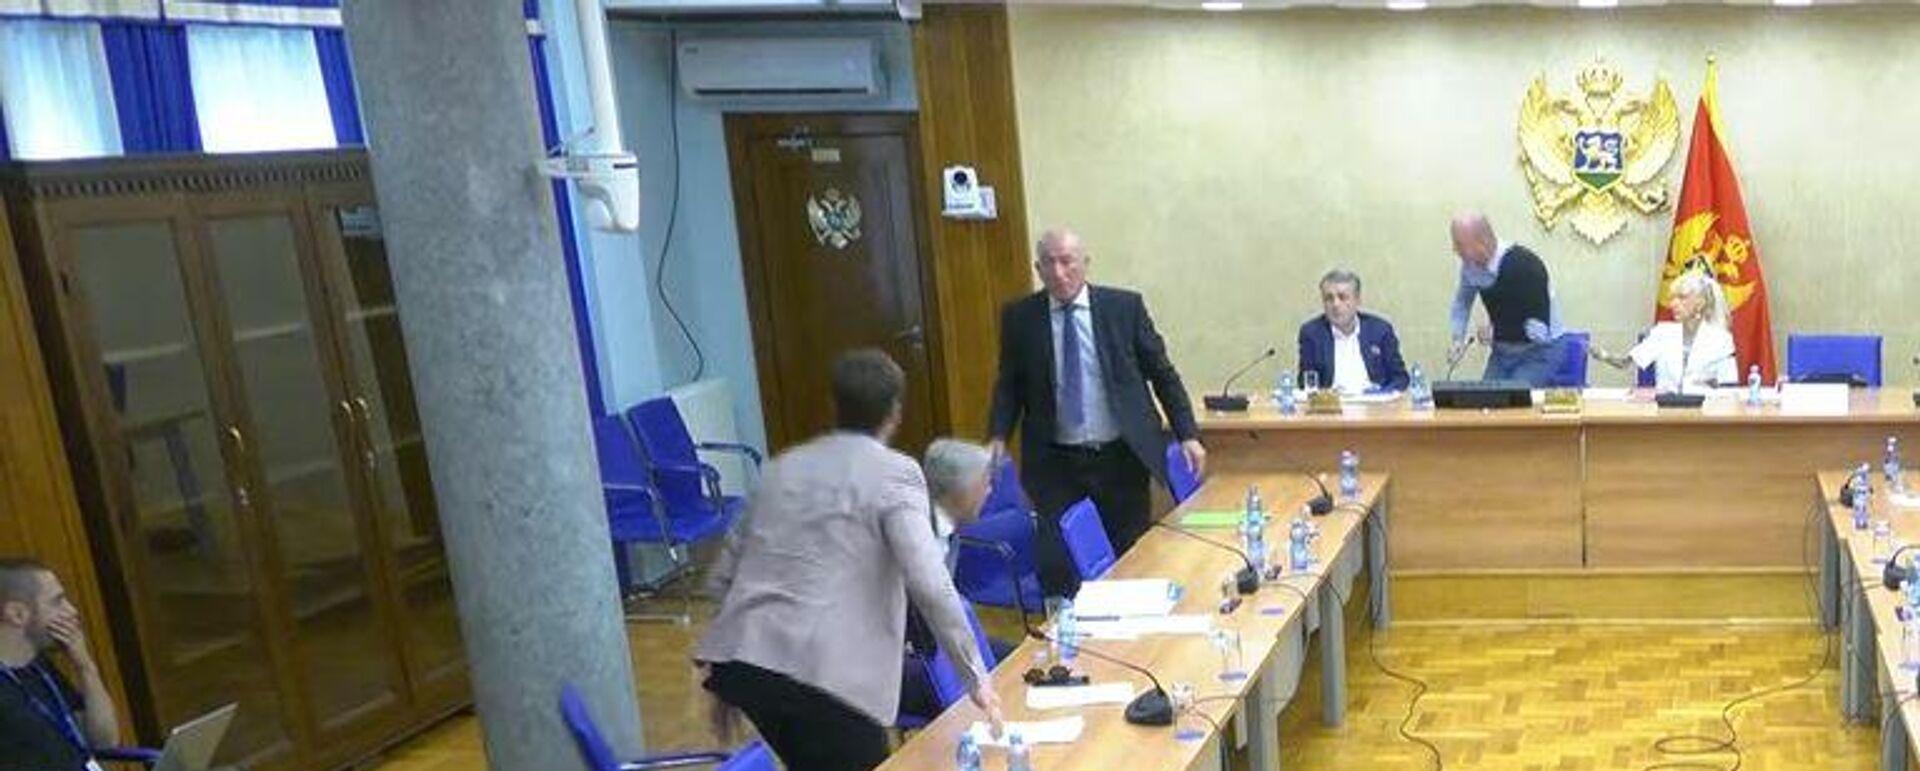 Седница одбора за безбедност - Sputnik Србија, 1920, 30.07.2021